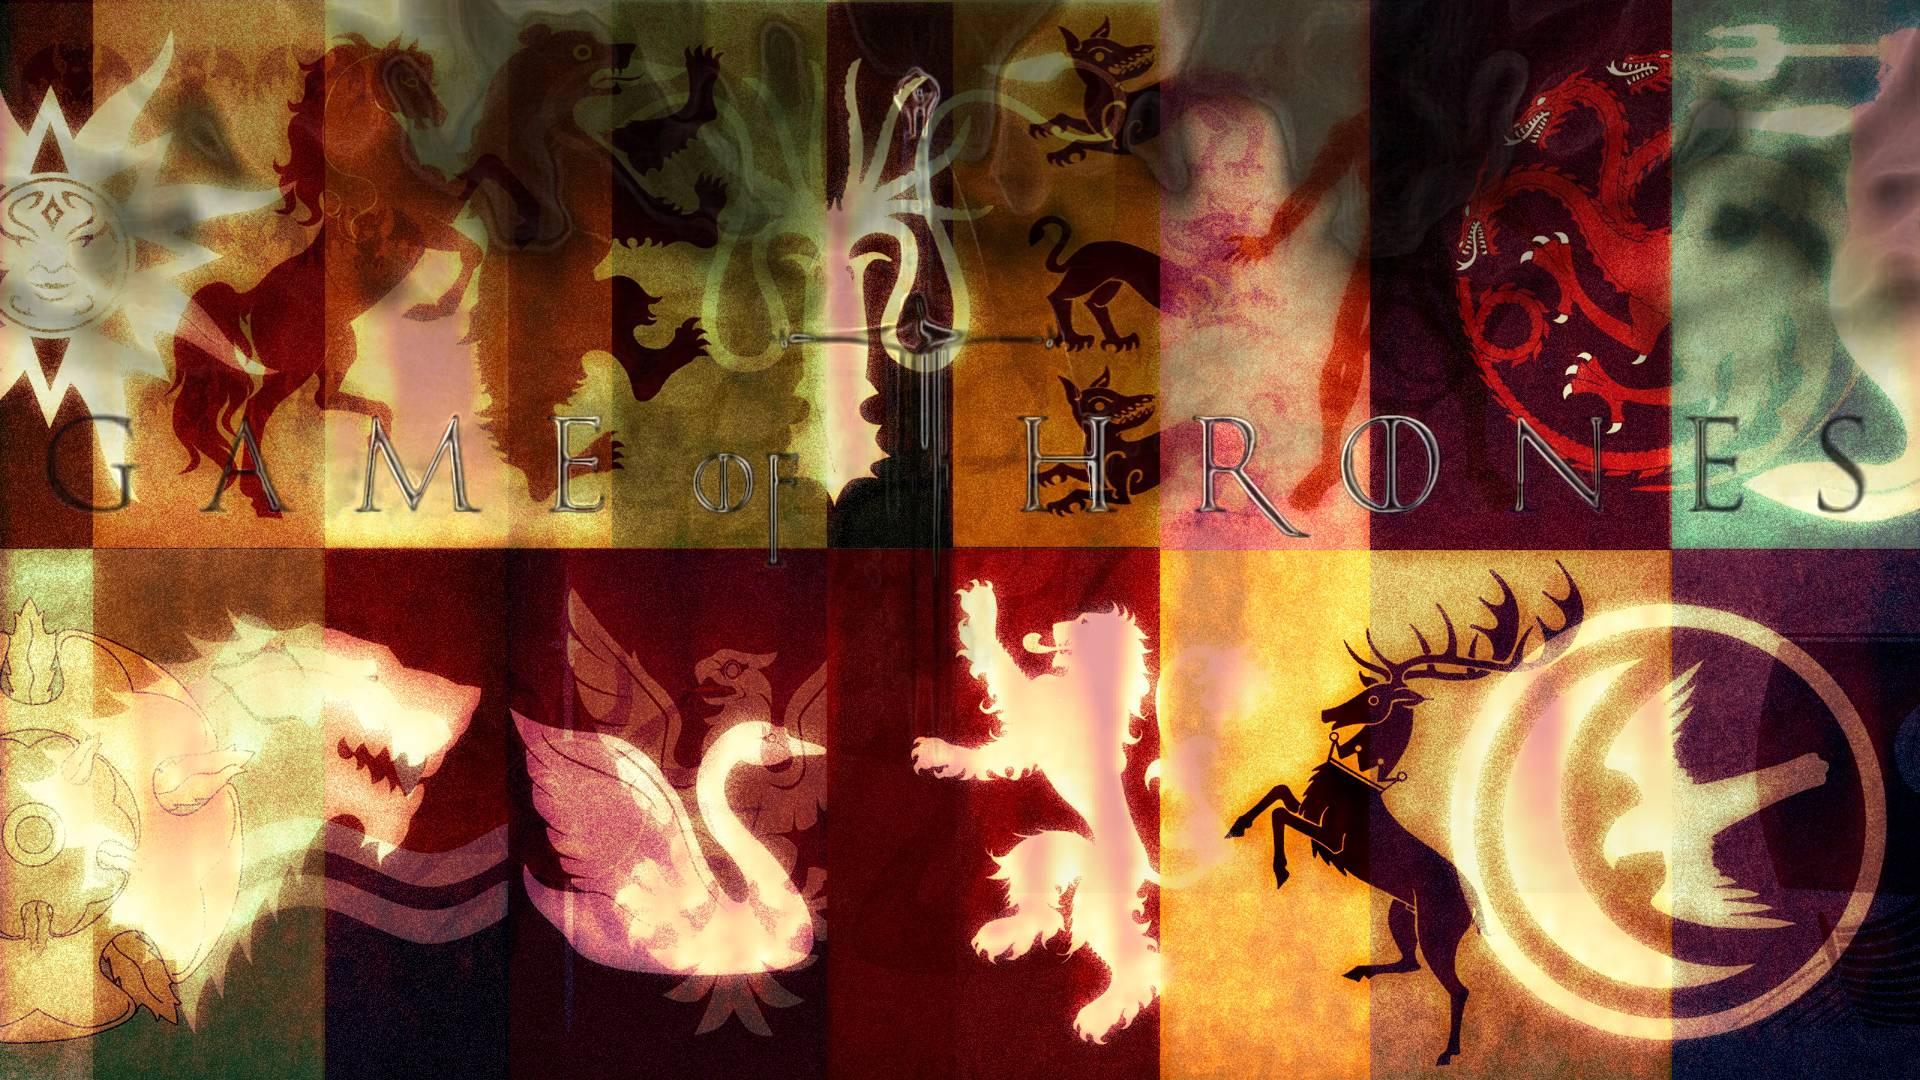 Fire Hd Wallpapers 1080p Game Of Thrones Hd Masa 252 St 252 Duvar Kağıtları Rooteto